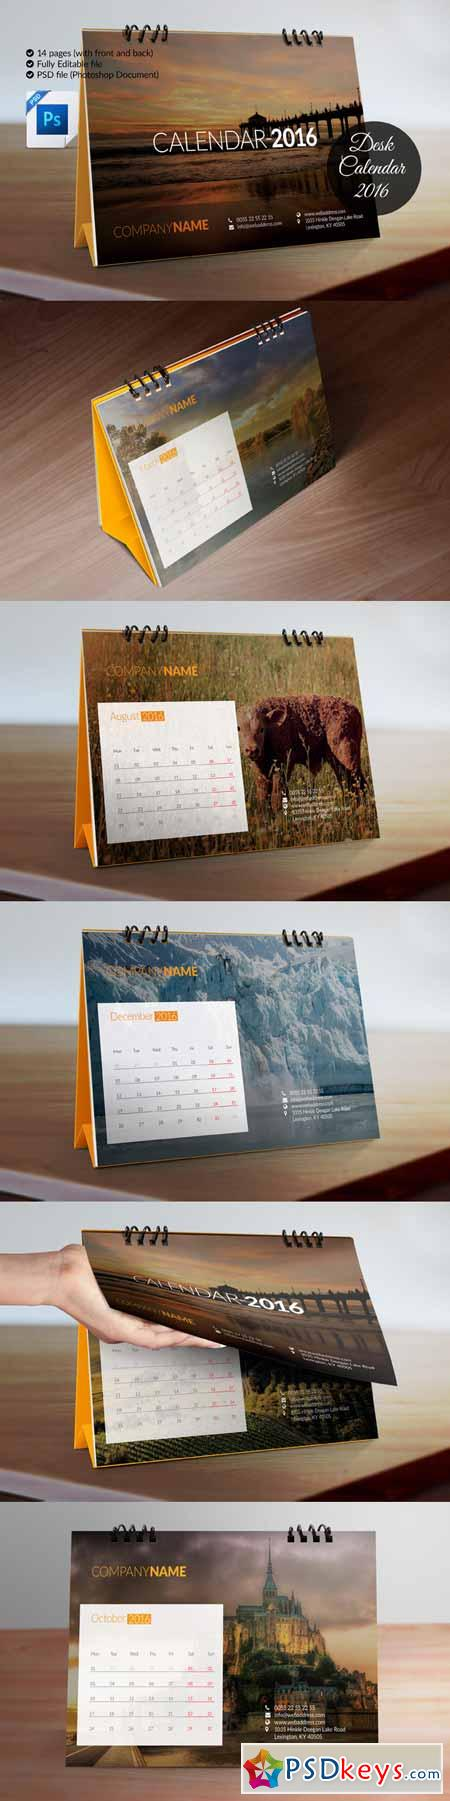 desk calendar template for 2016 478531 free download photoshop